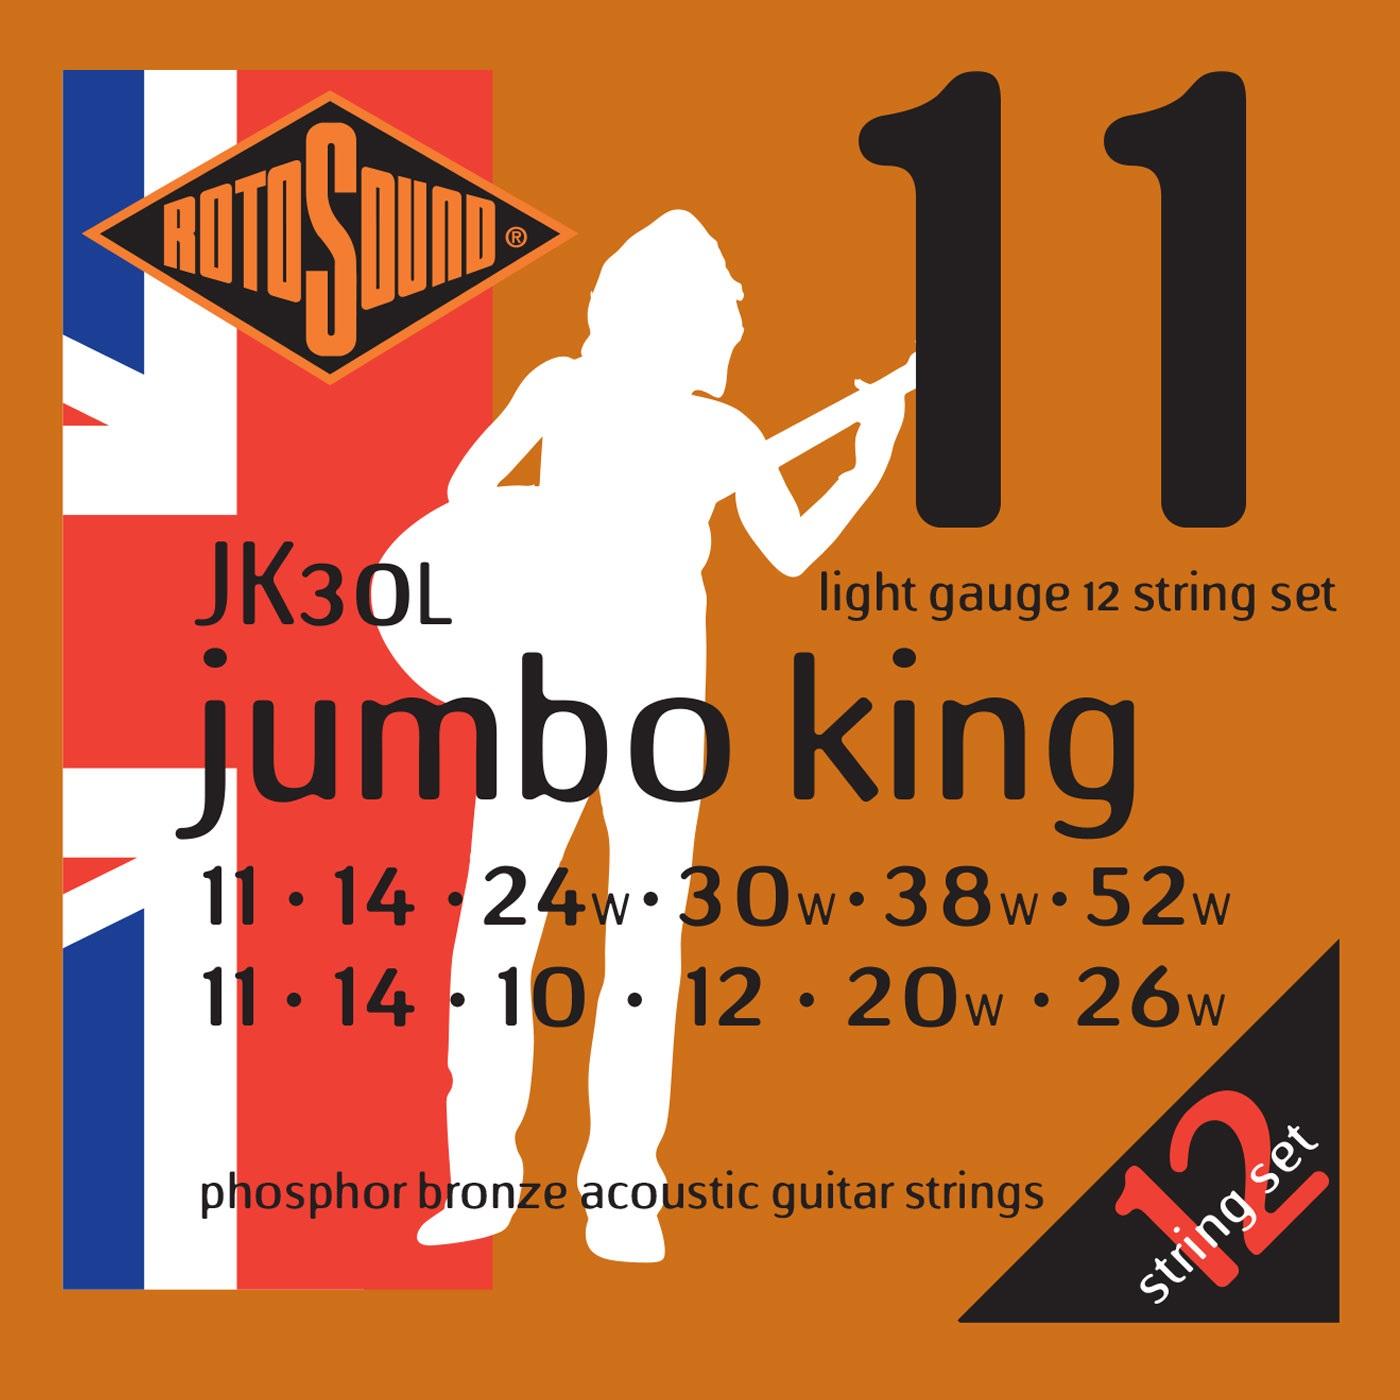 Rotosound JK30L Jumbo King